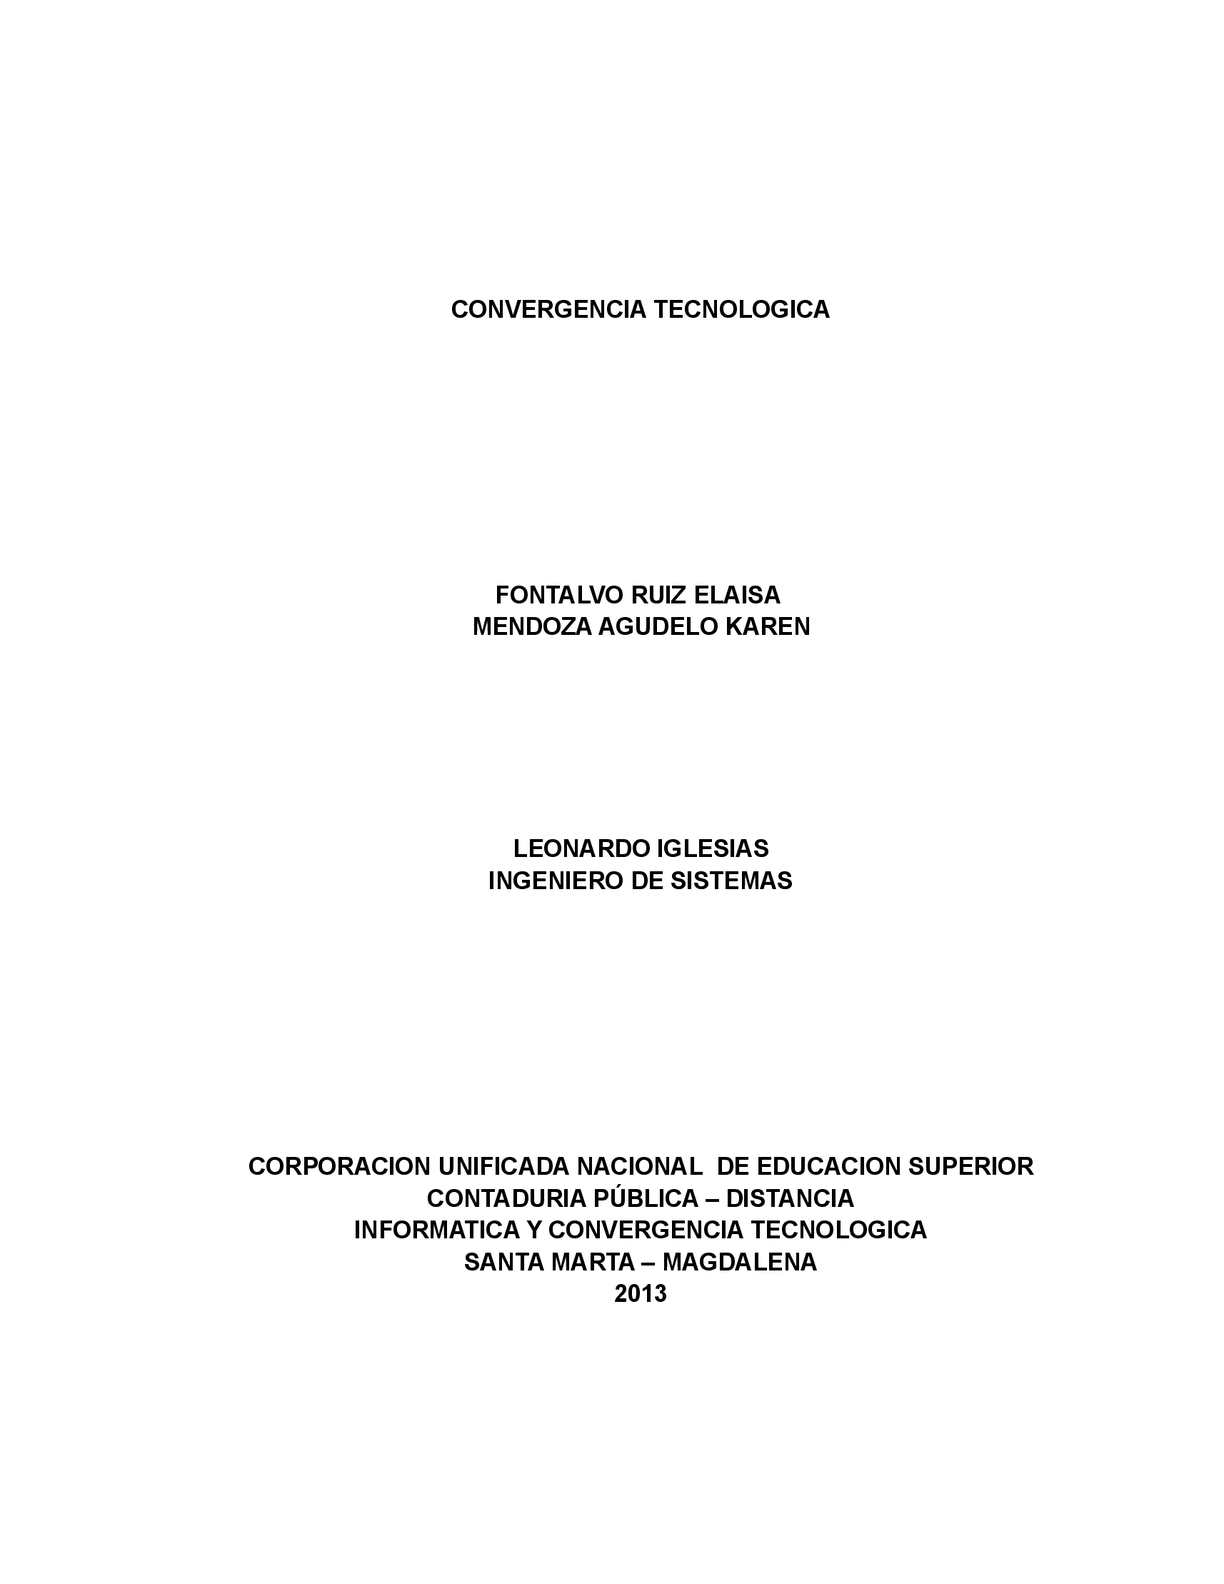 b31f72af95 Calaméo - CONVERGENCIA TECNOLOGICA